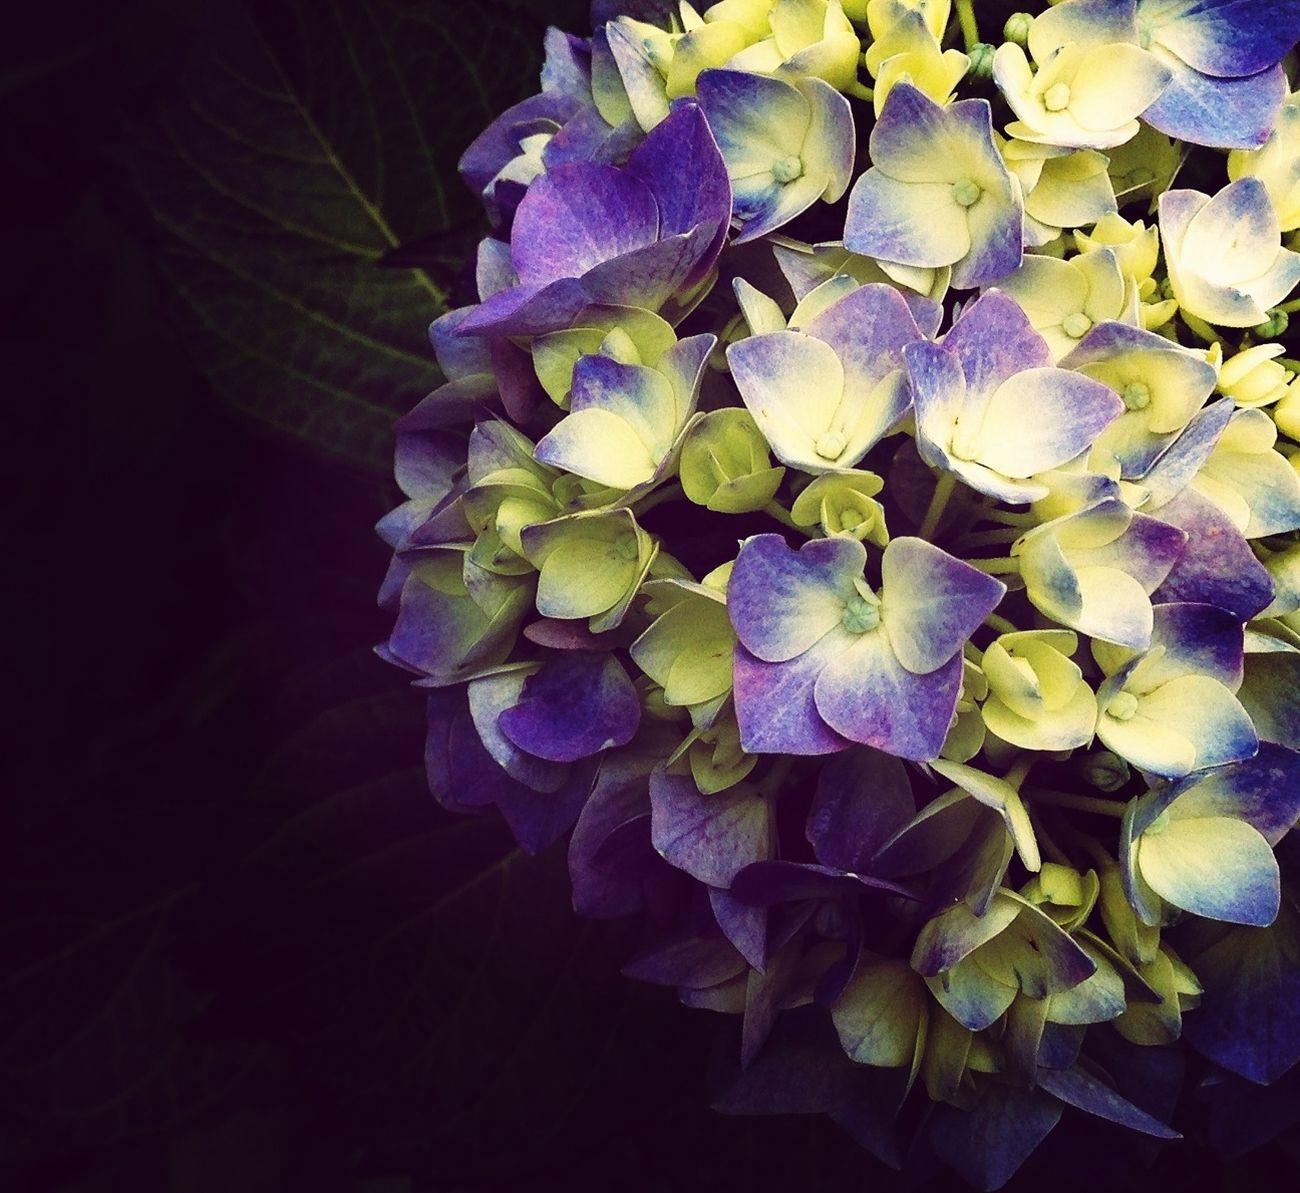 Hydrangea Flower Porn Nature_collection EyeEm Nature Lover